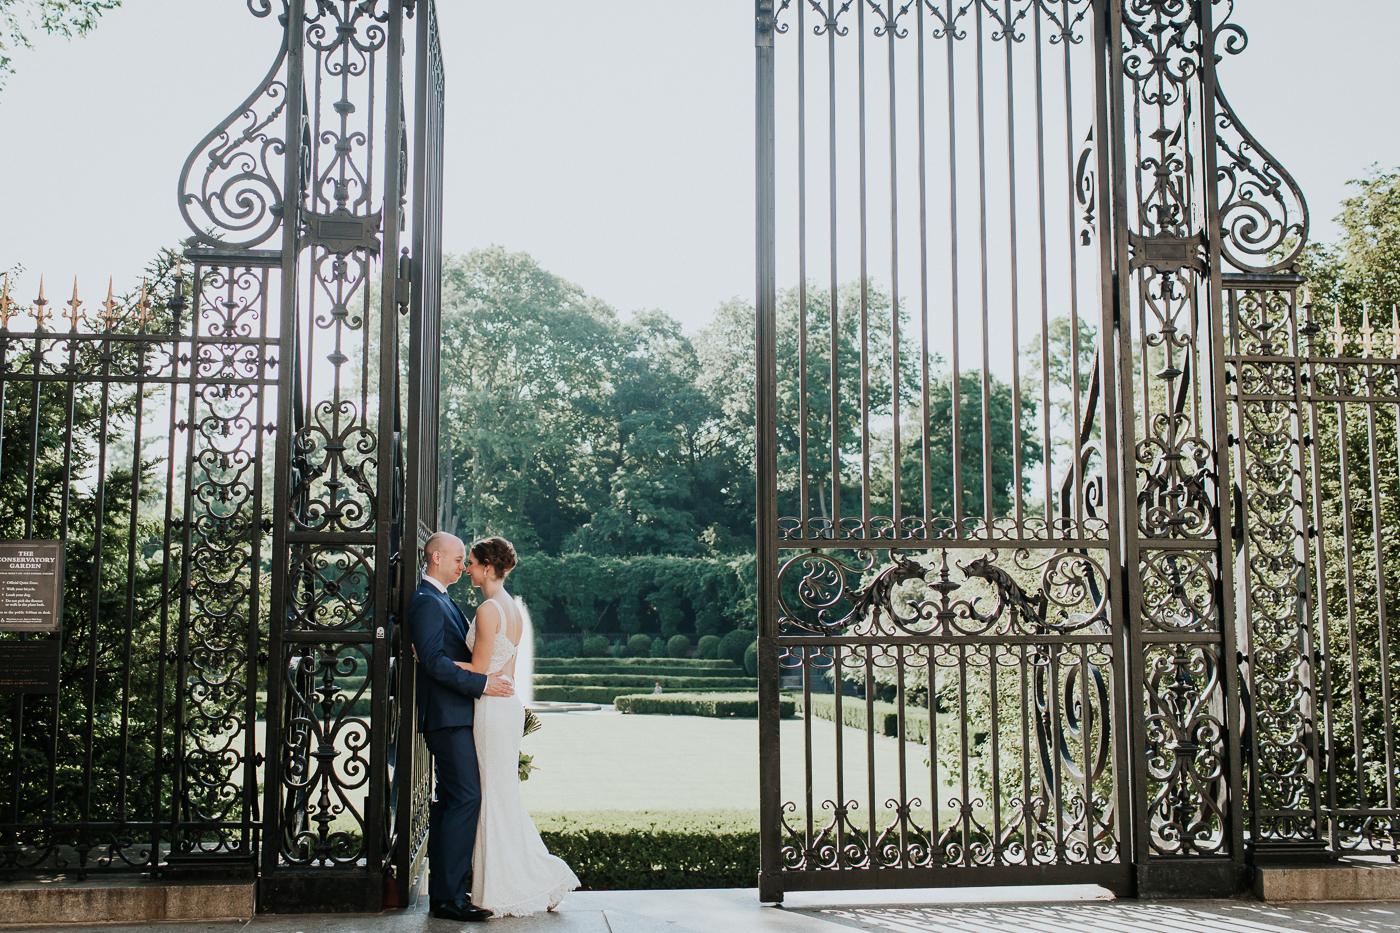 NYC-Central-Park-Conservatory-Garden-Intimate-Elopement-Documentary-Wedding-Photographer-46.jpg